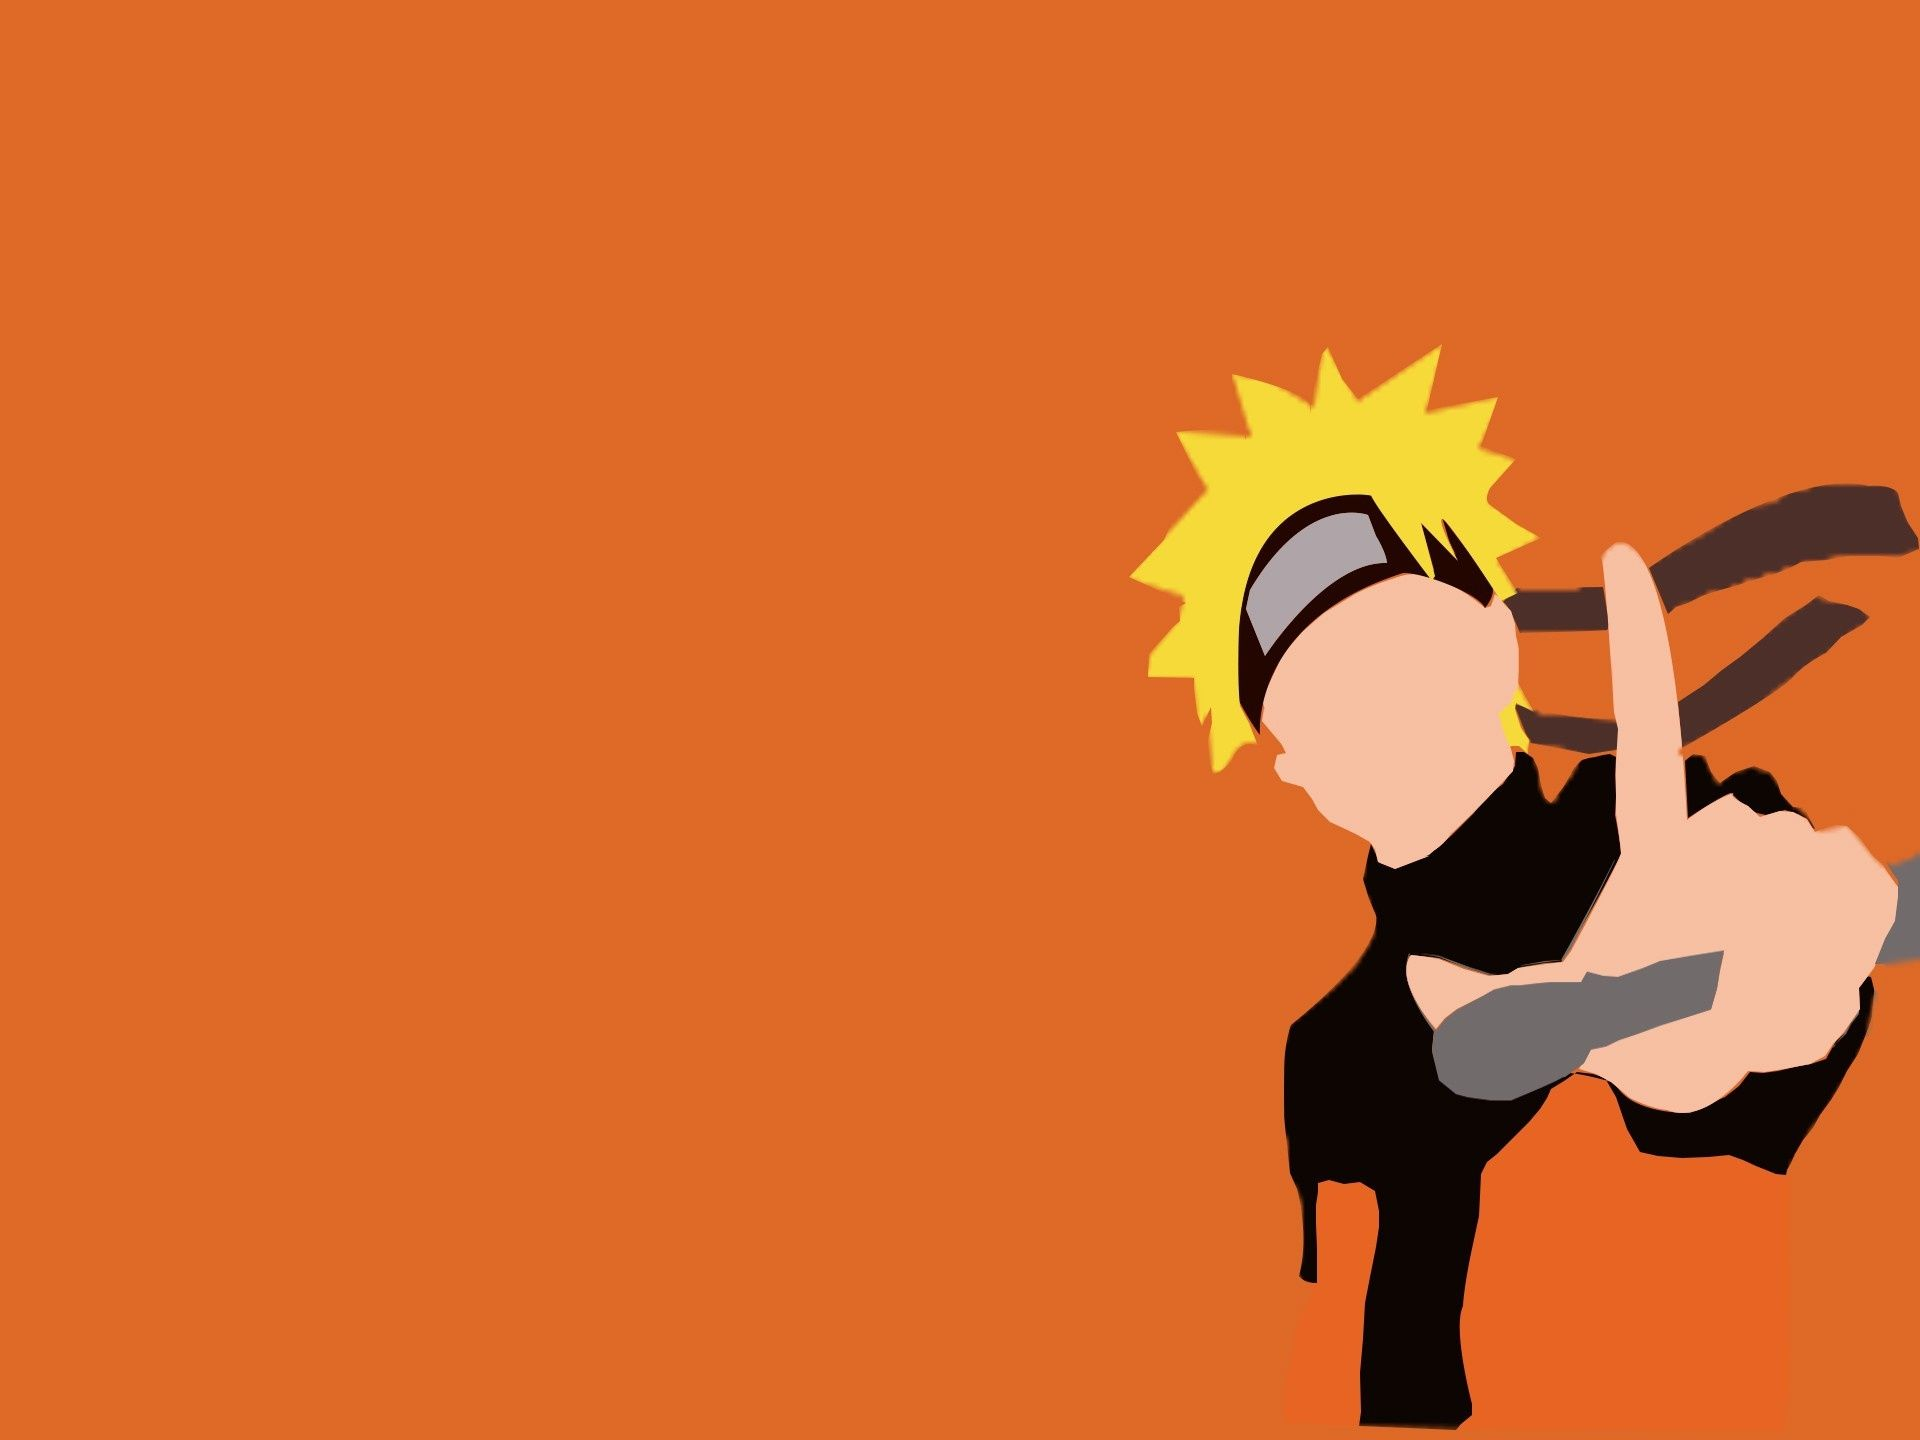 Naruto Minimalist, PC Wallpaper